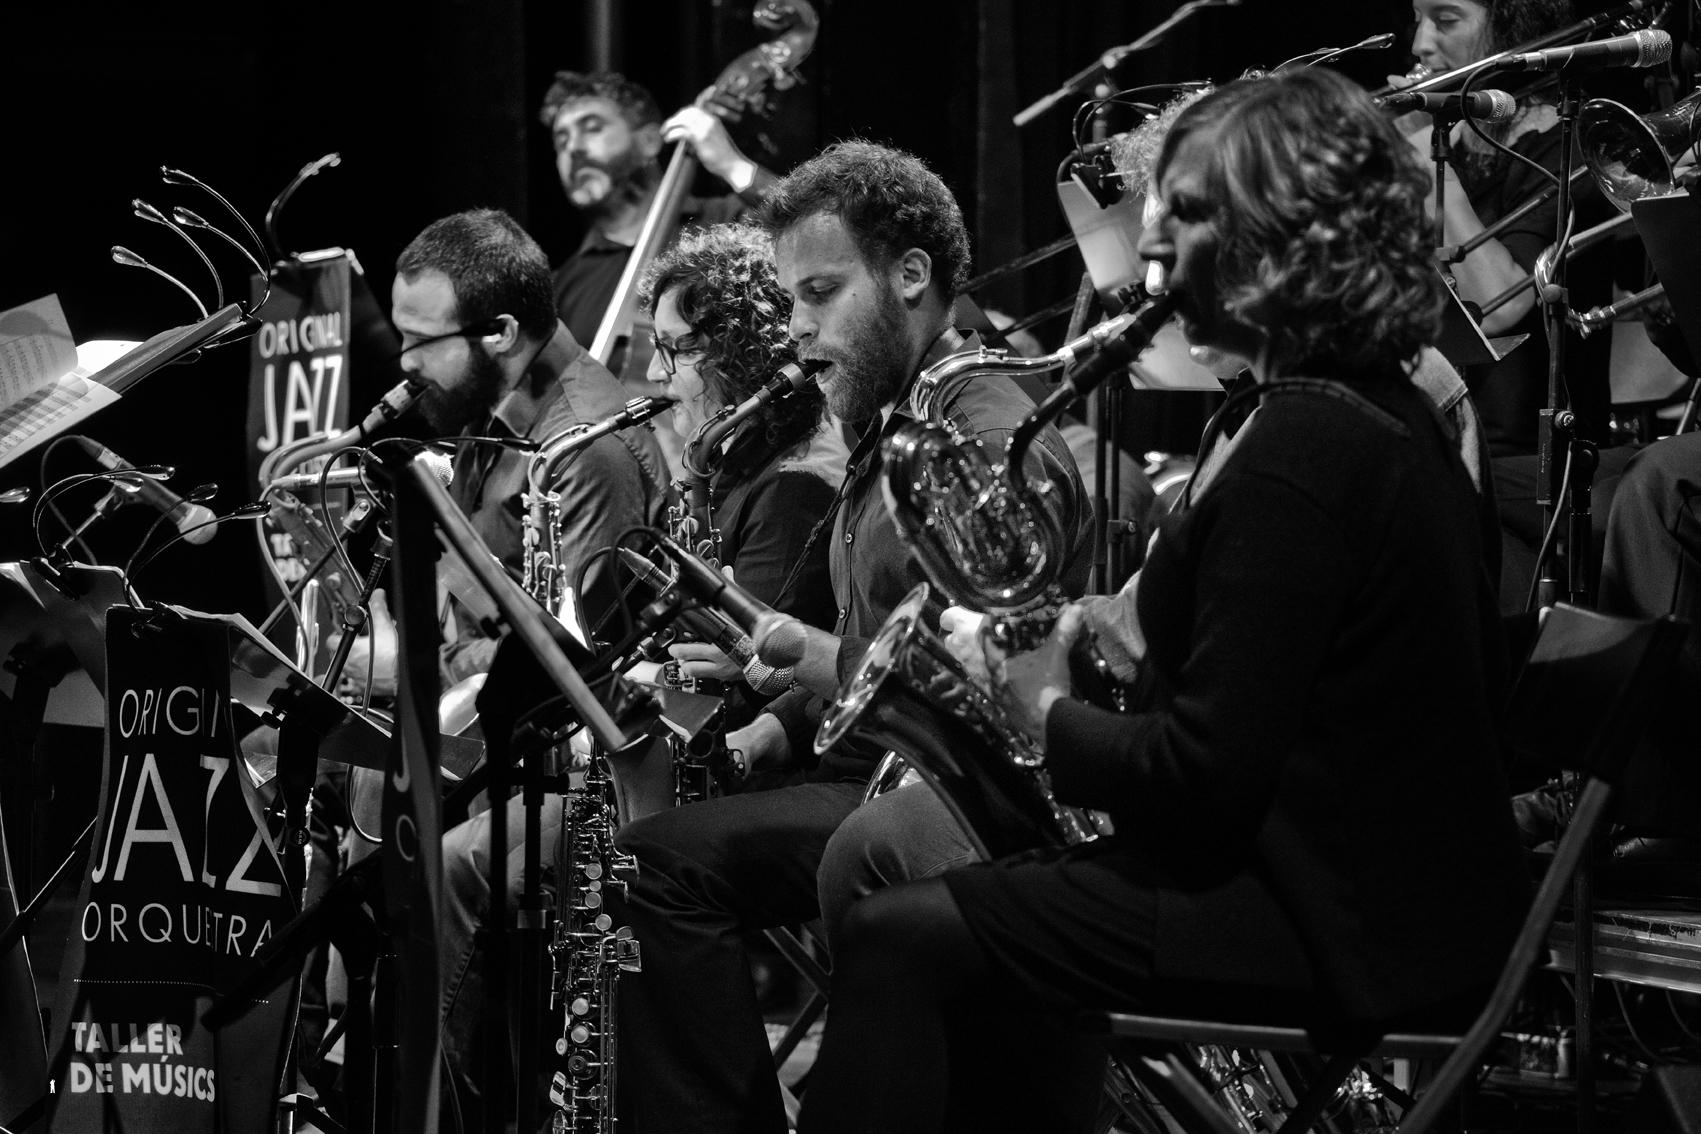 Original Jazz Orquestra